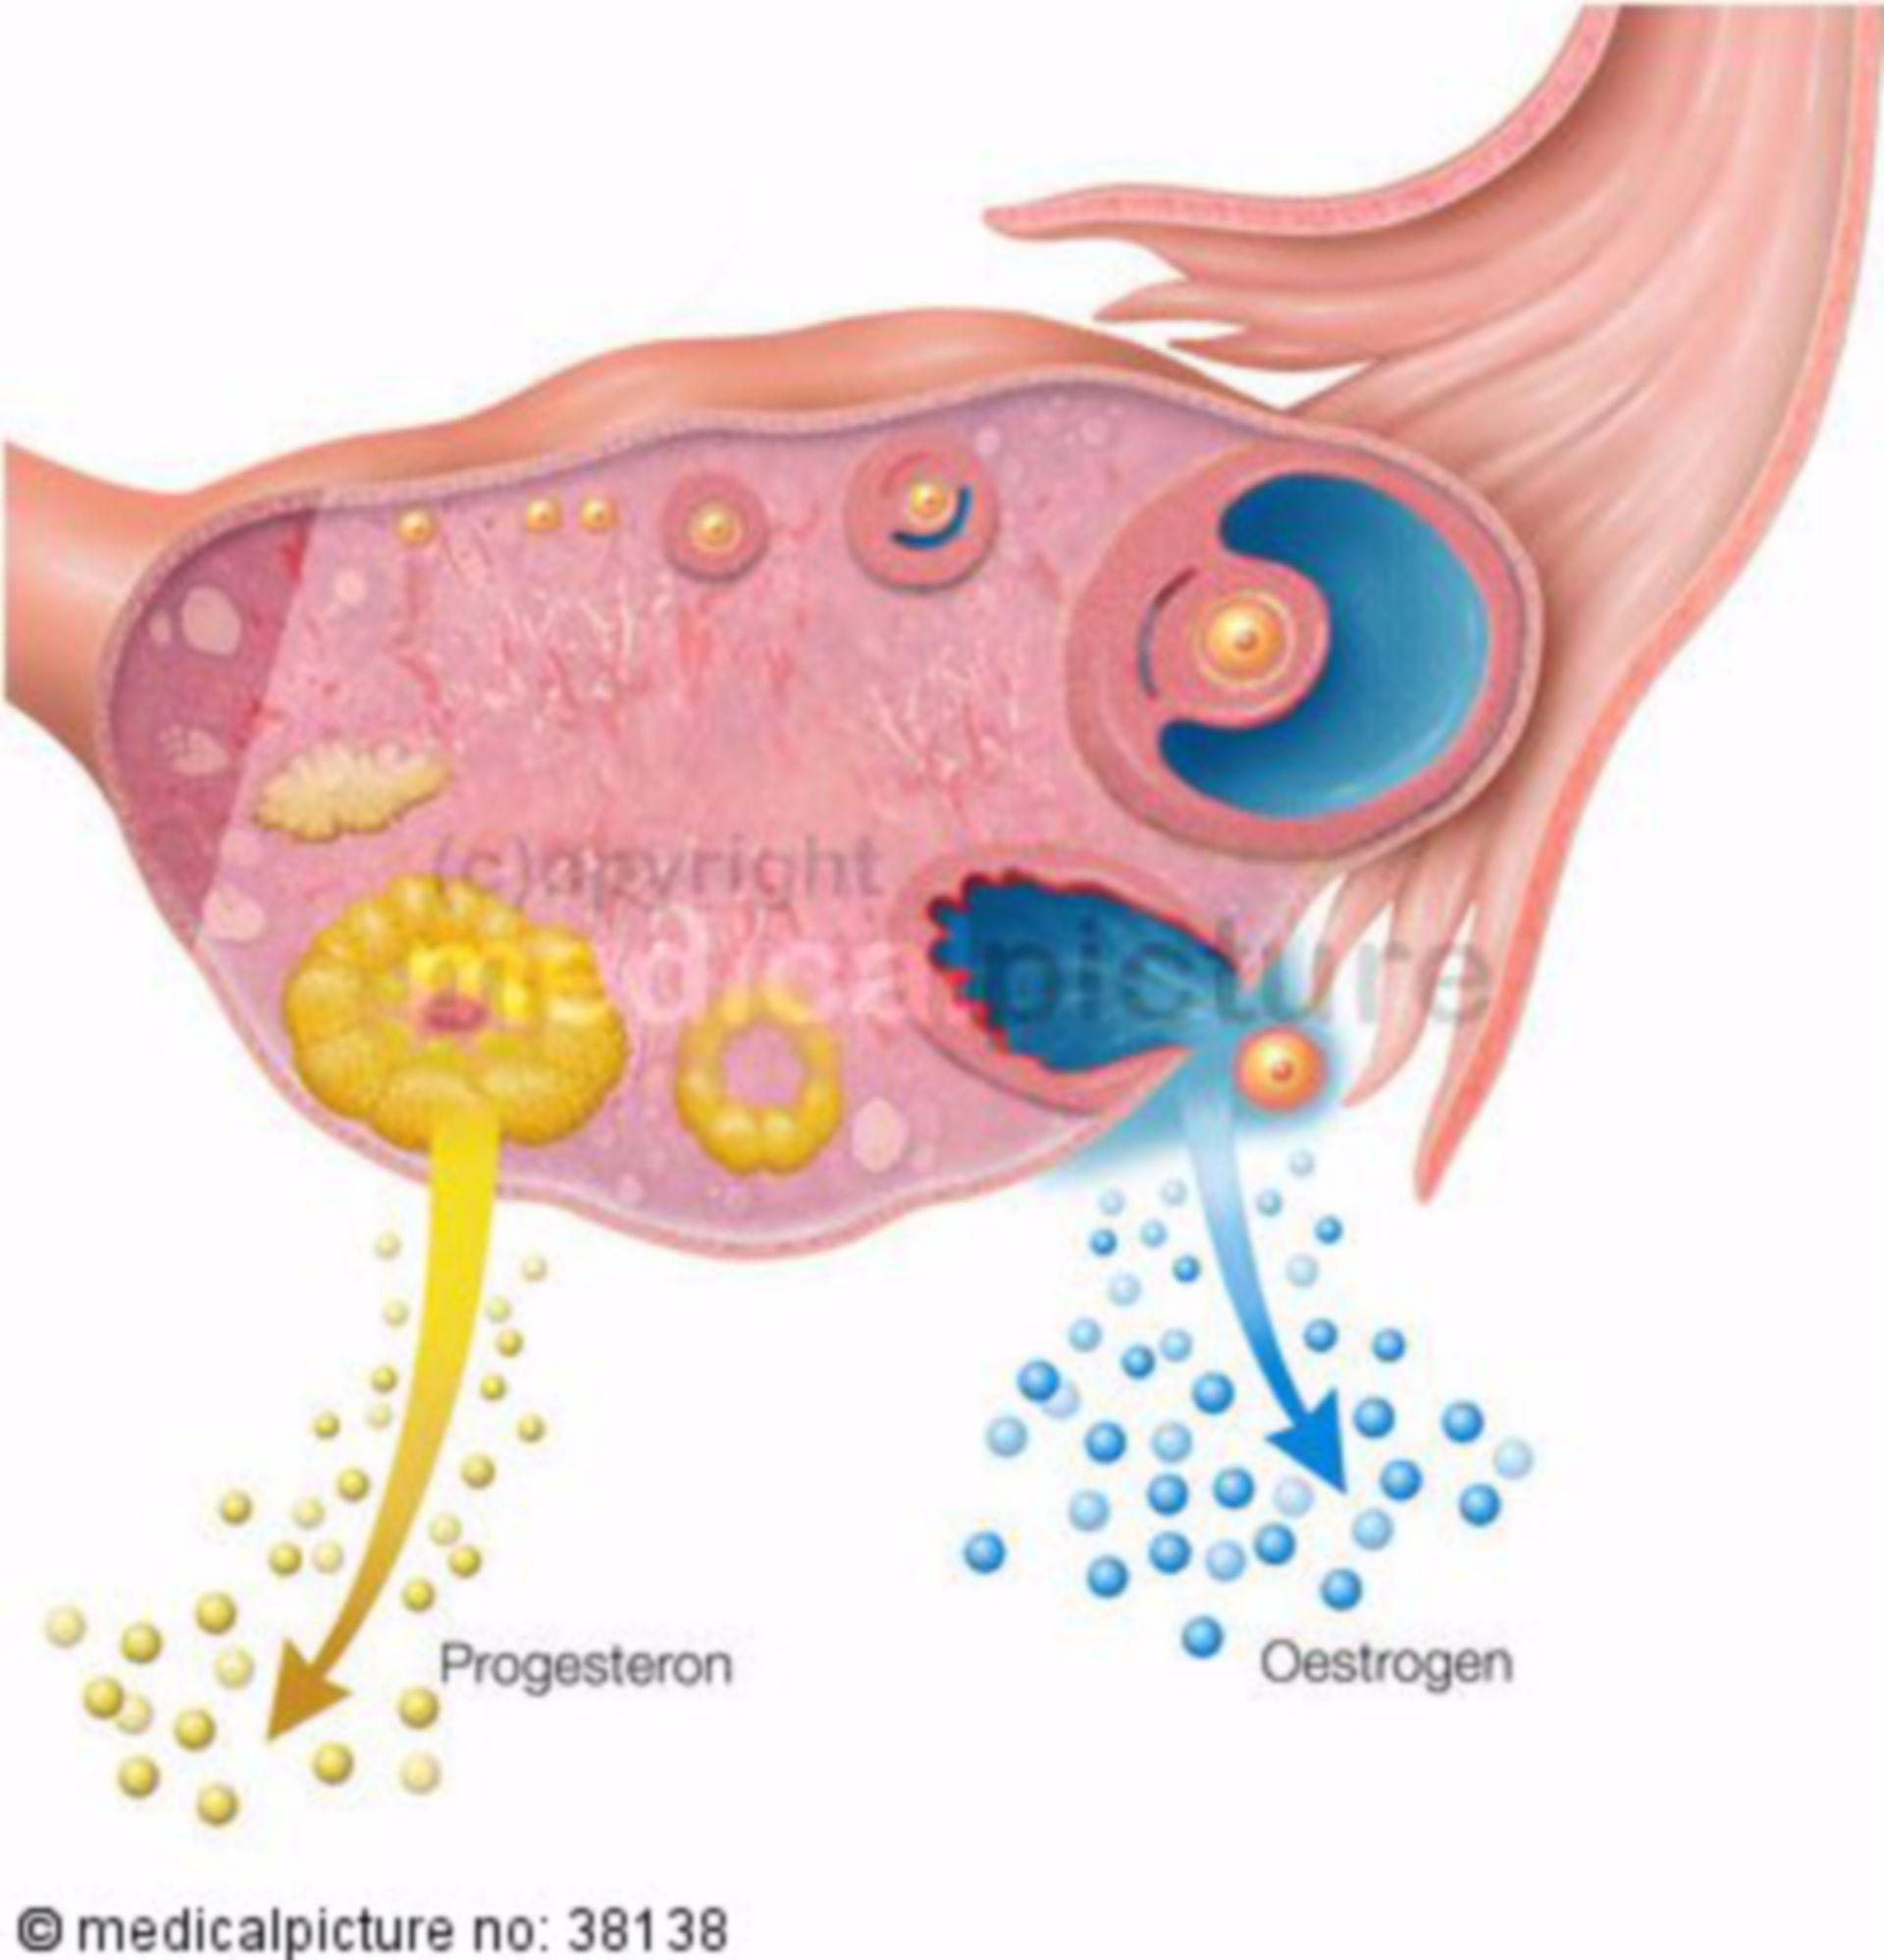 Female cycle, ovulation